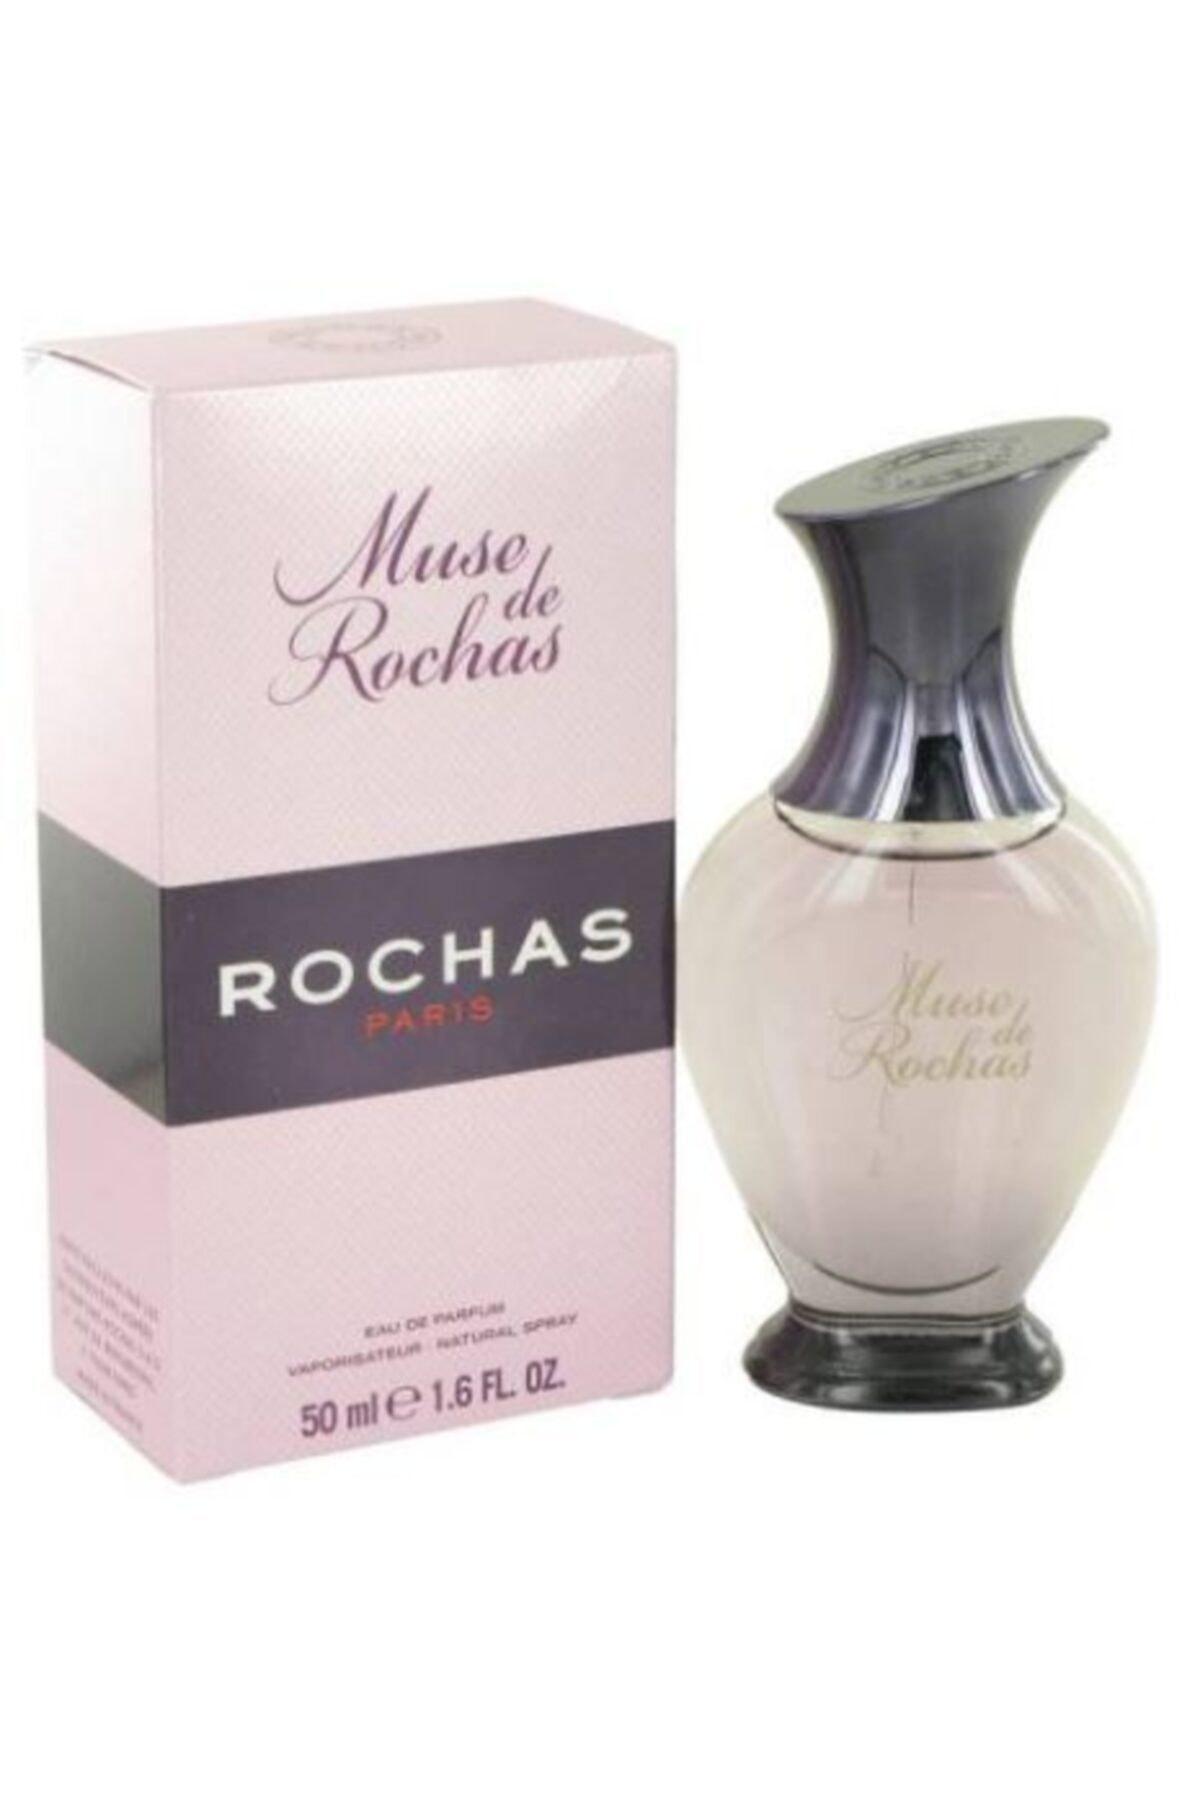 ROCHAS Muse De Edp 50 Ml - Ith. Belge 1